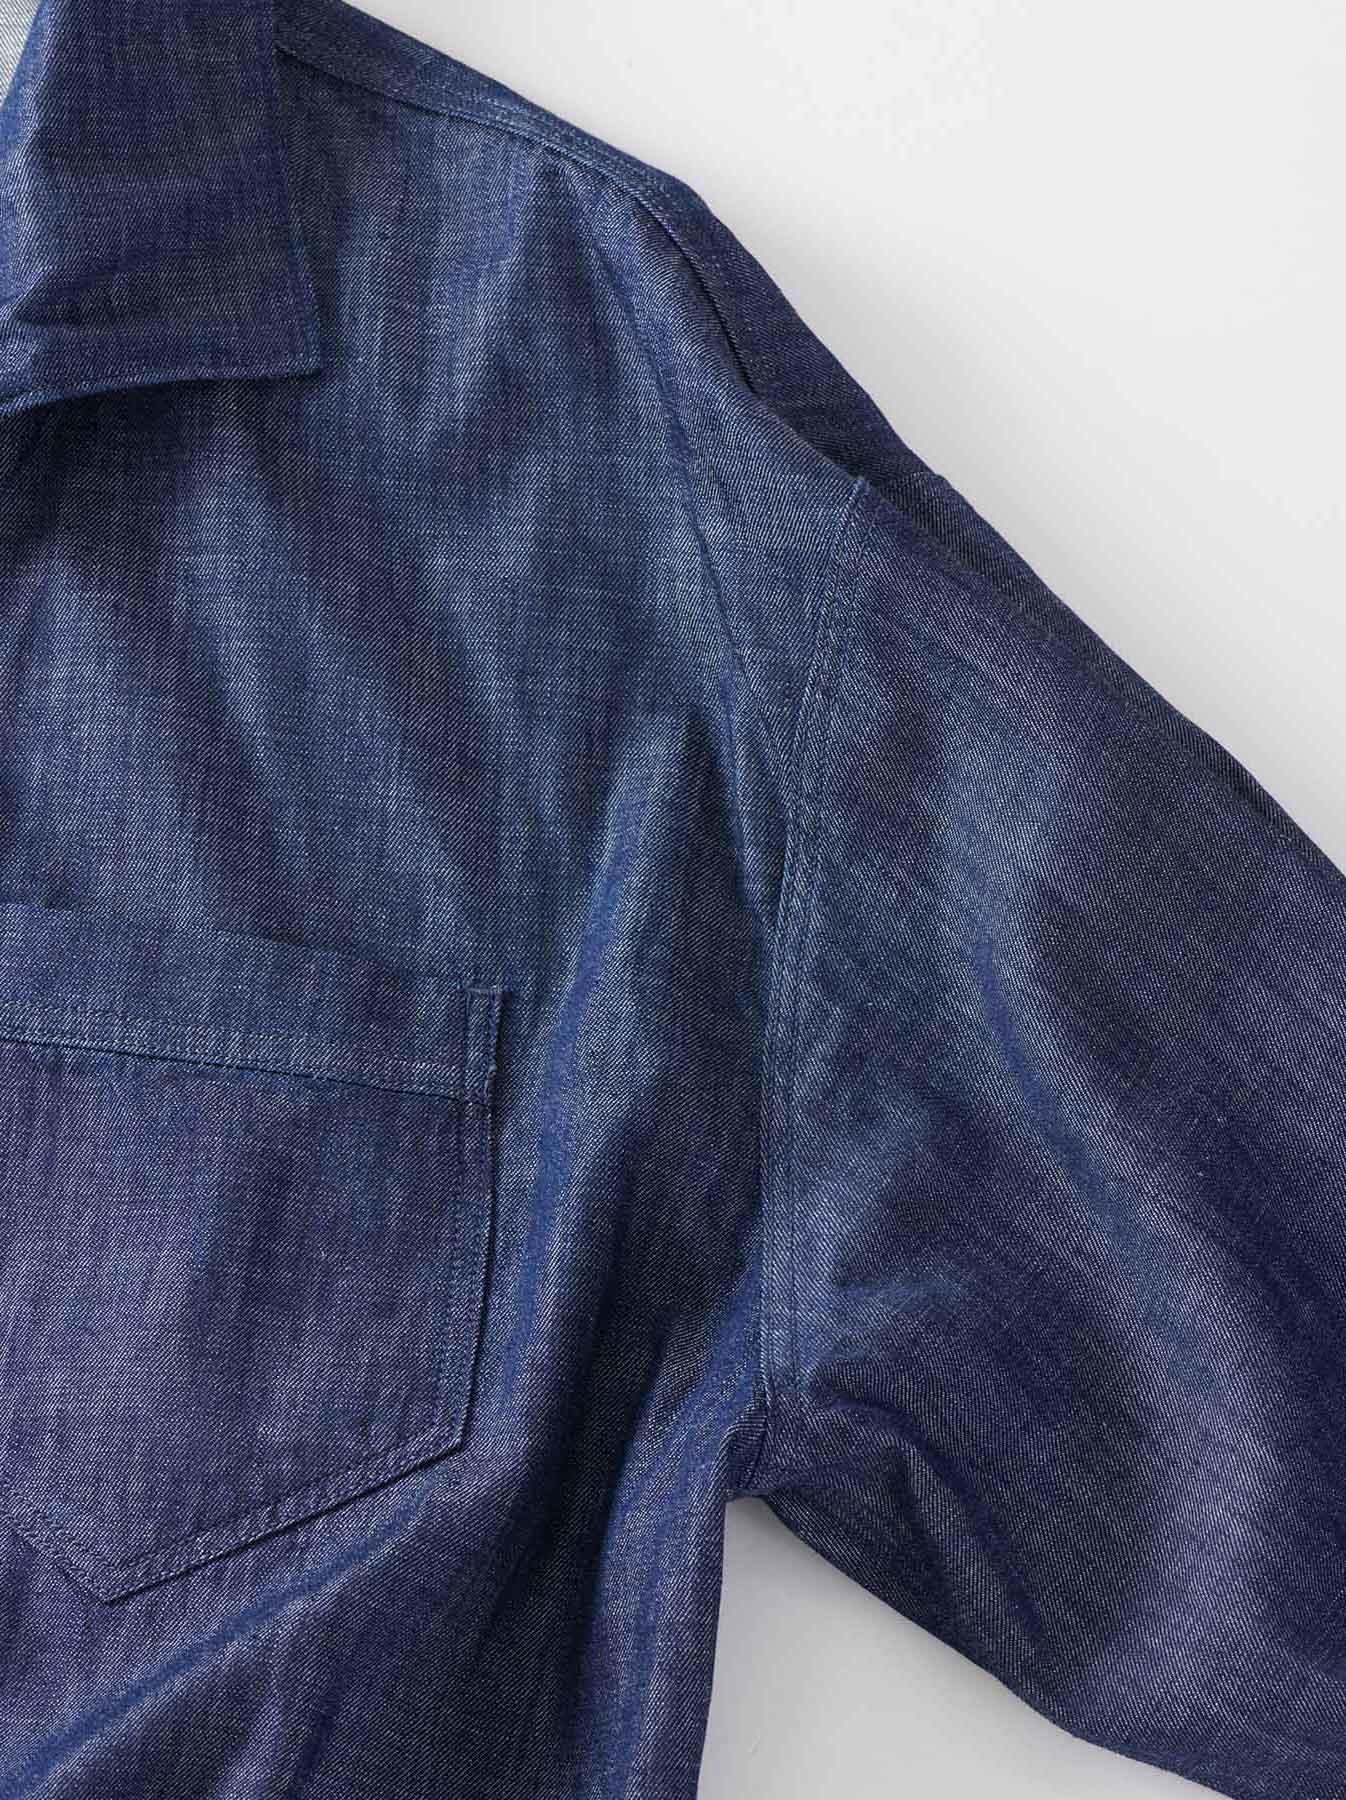 WH Goma Denim Umahiko Pullover Shirt-7